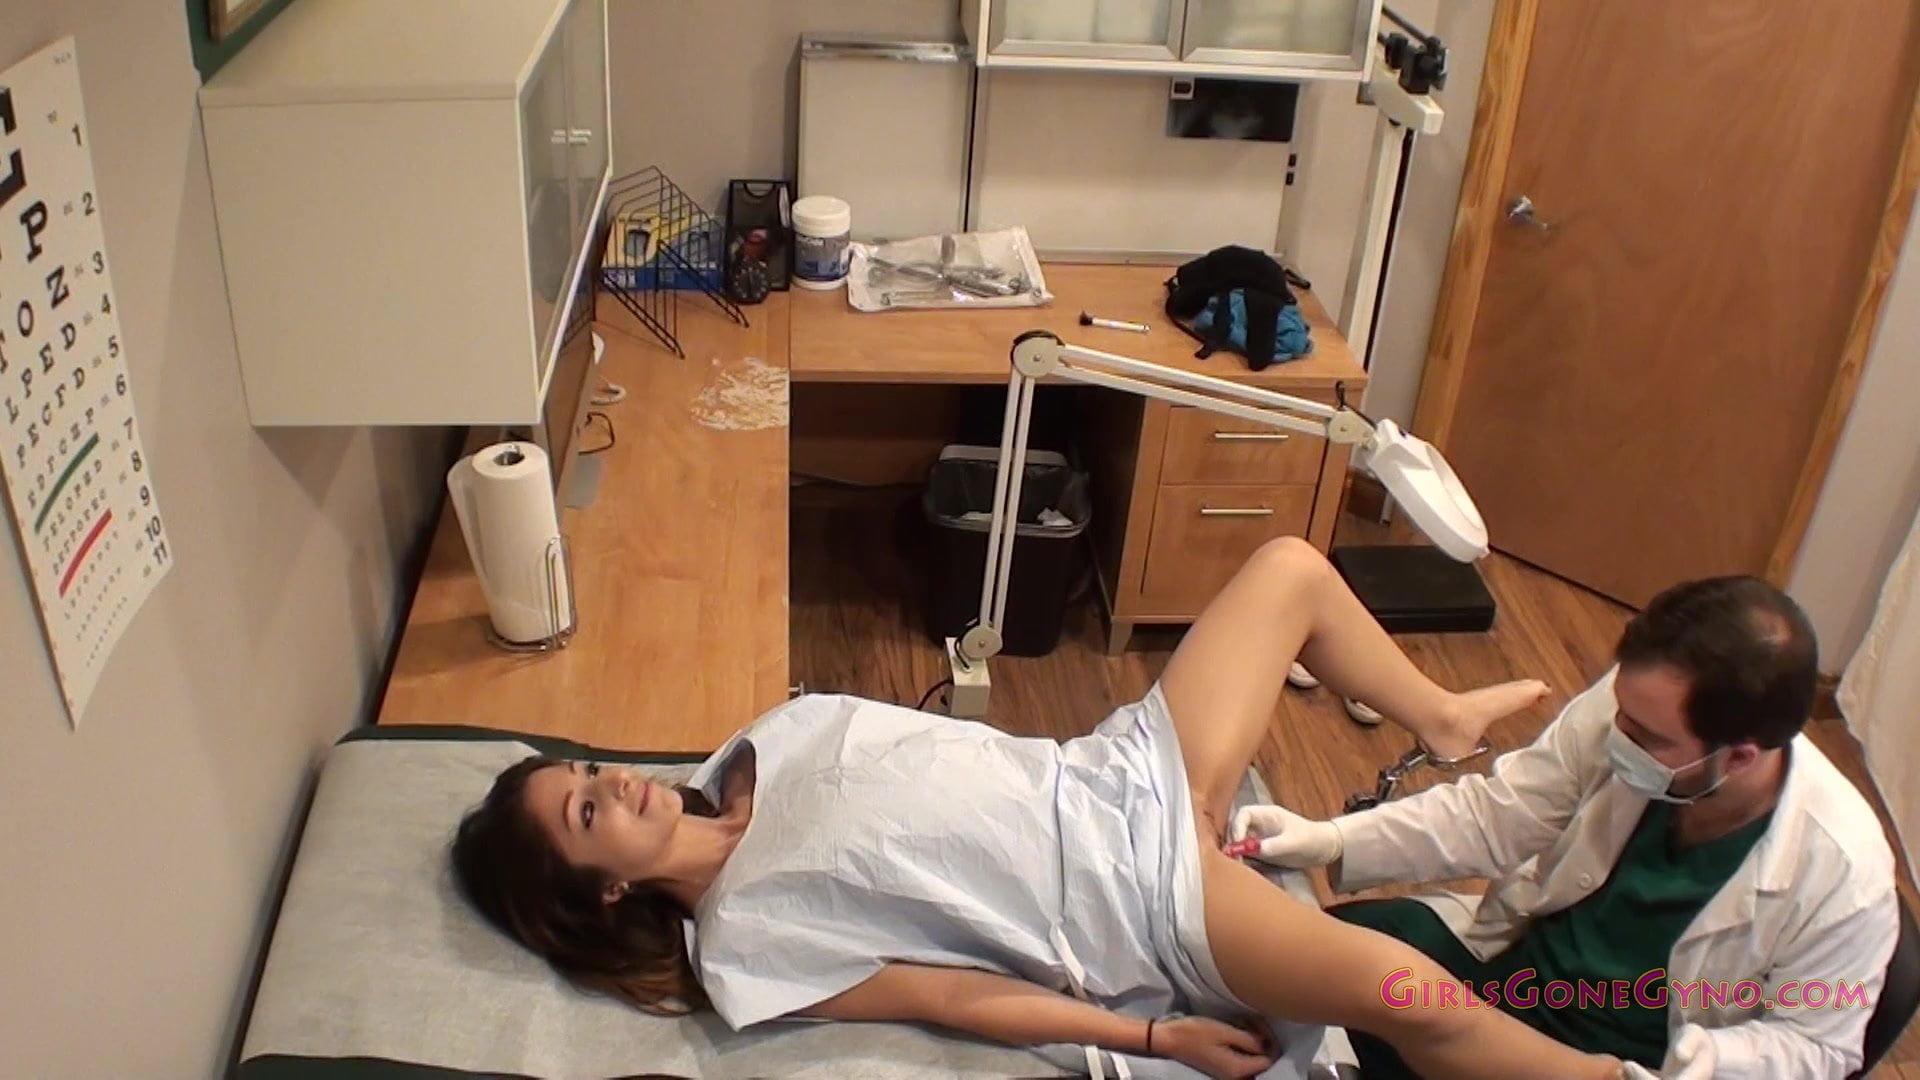 Naked girls gettign examined gyno x Alexa Rydells Gyno Exam Full Physical From Doctor Xhamster